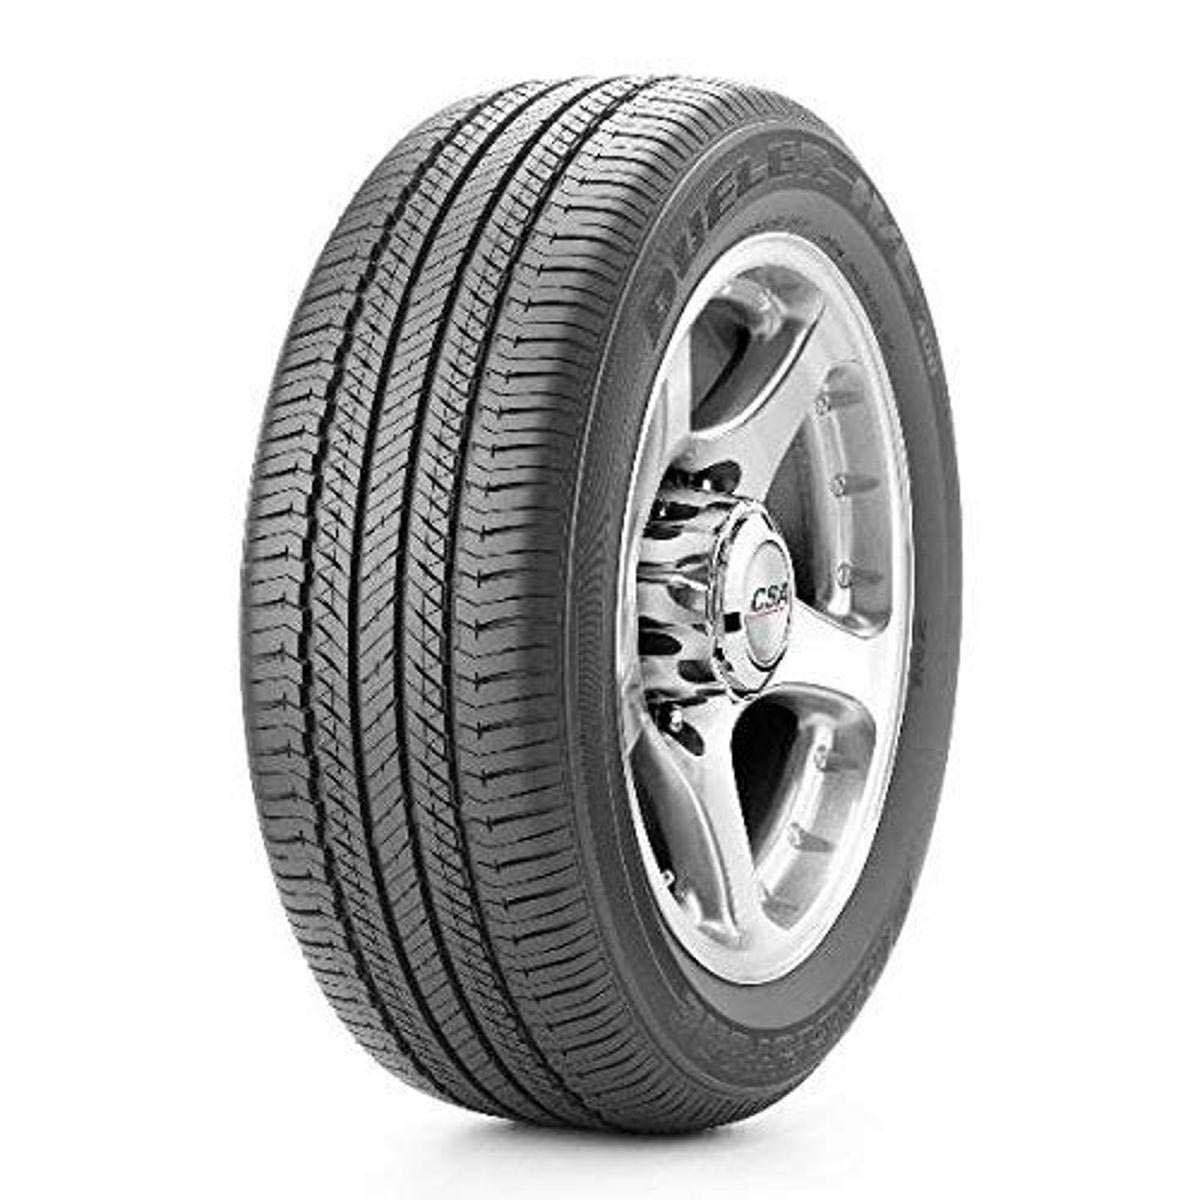 Firestone FR710 All-Season Passenger Tire P225/65R17 100 T